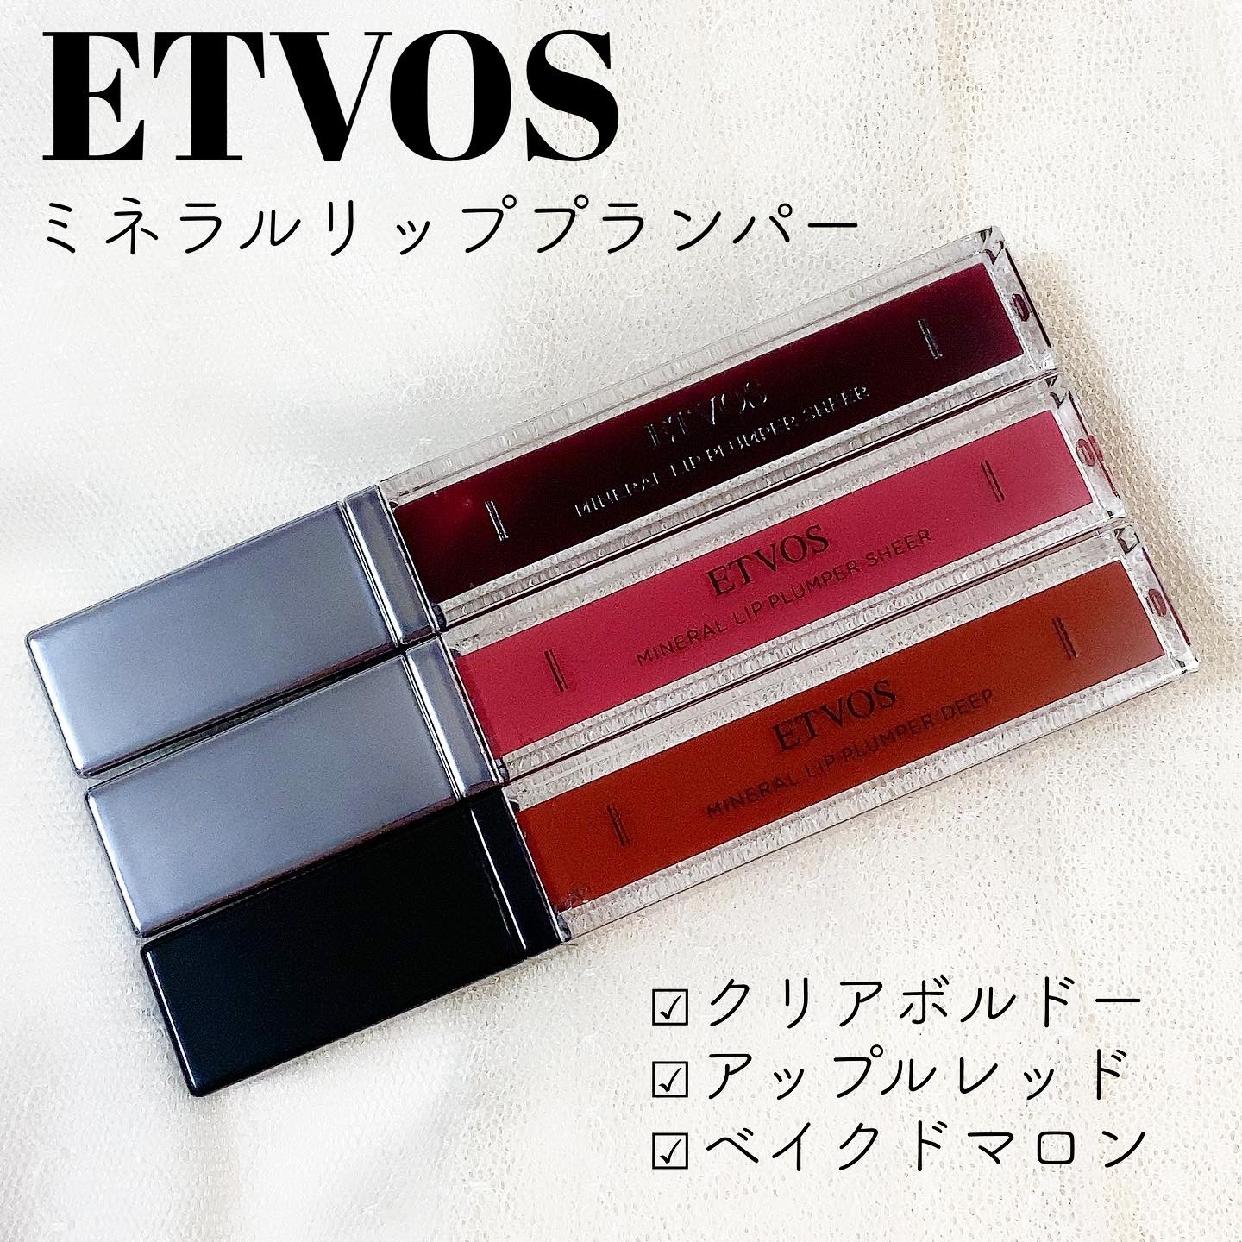 ETVOS(エトヴォス) ミネラルリッププランパー ディープを使った只野ひとみさんのクチコミ画像